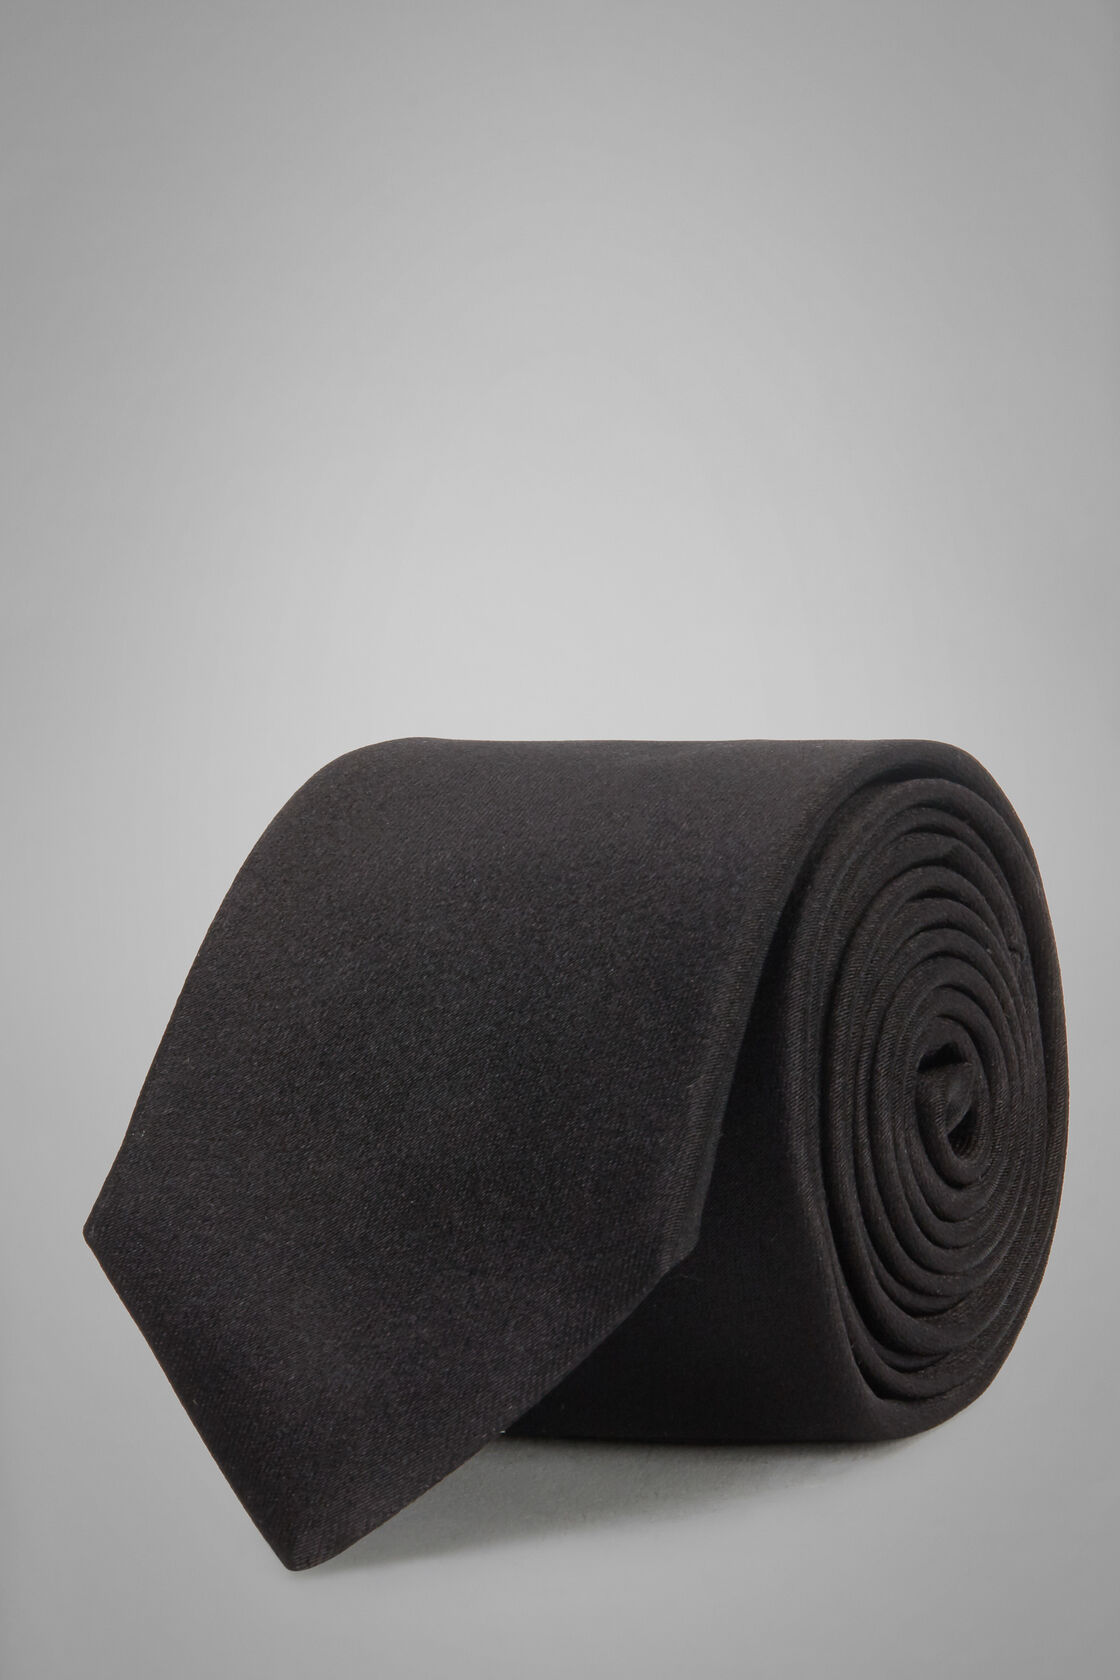 Cravatta In Raso Di Seta 7 Cm, Nero, hi-res